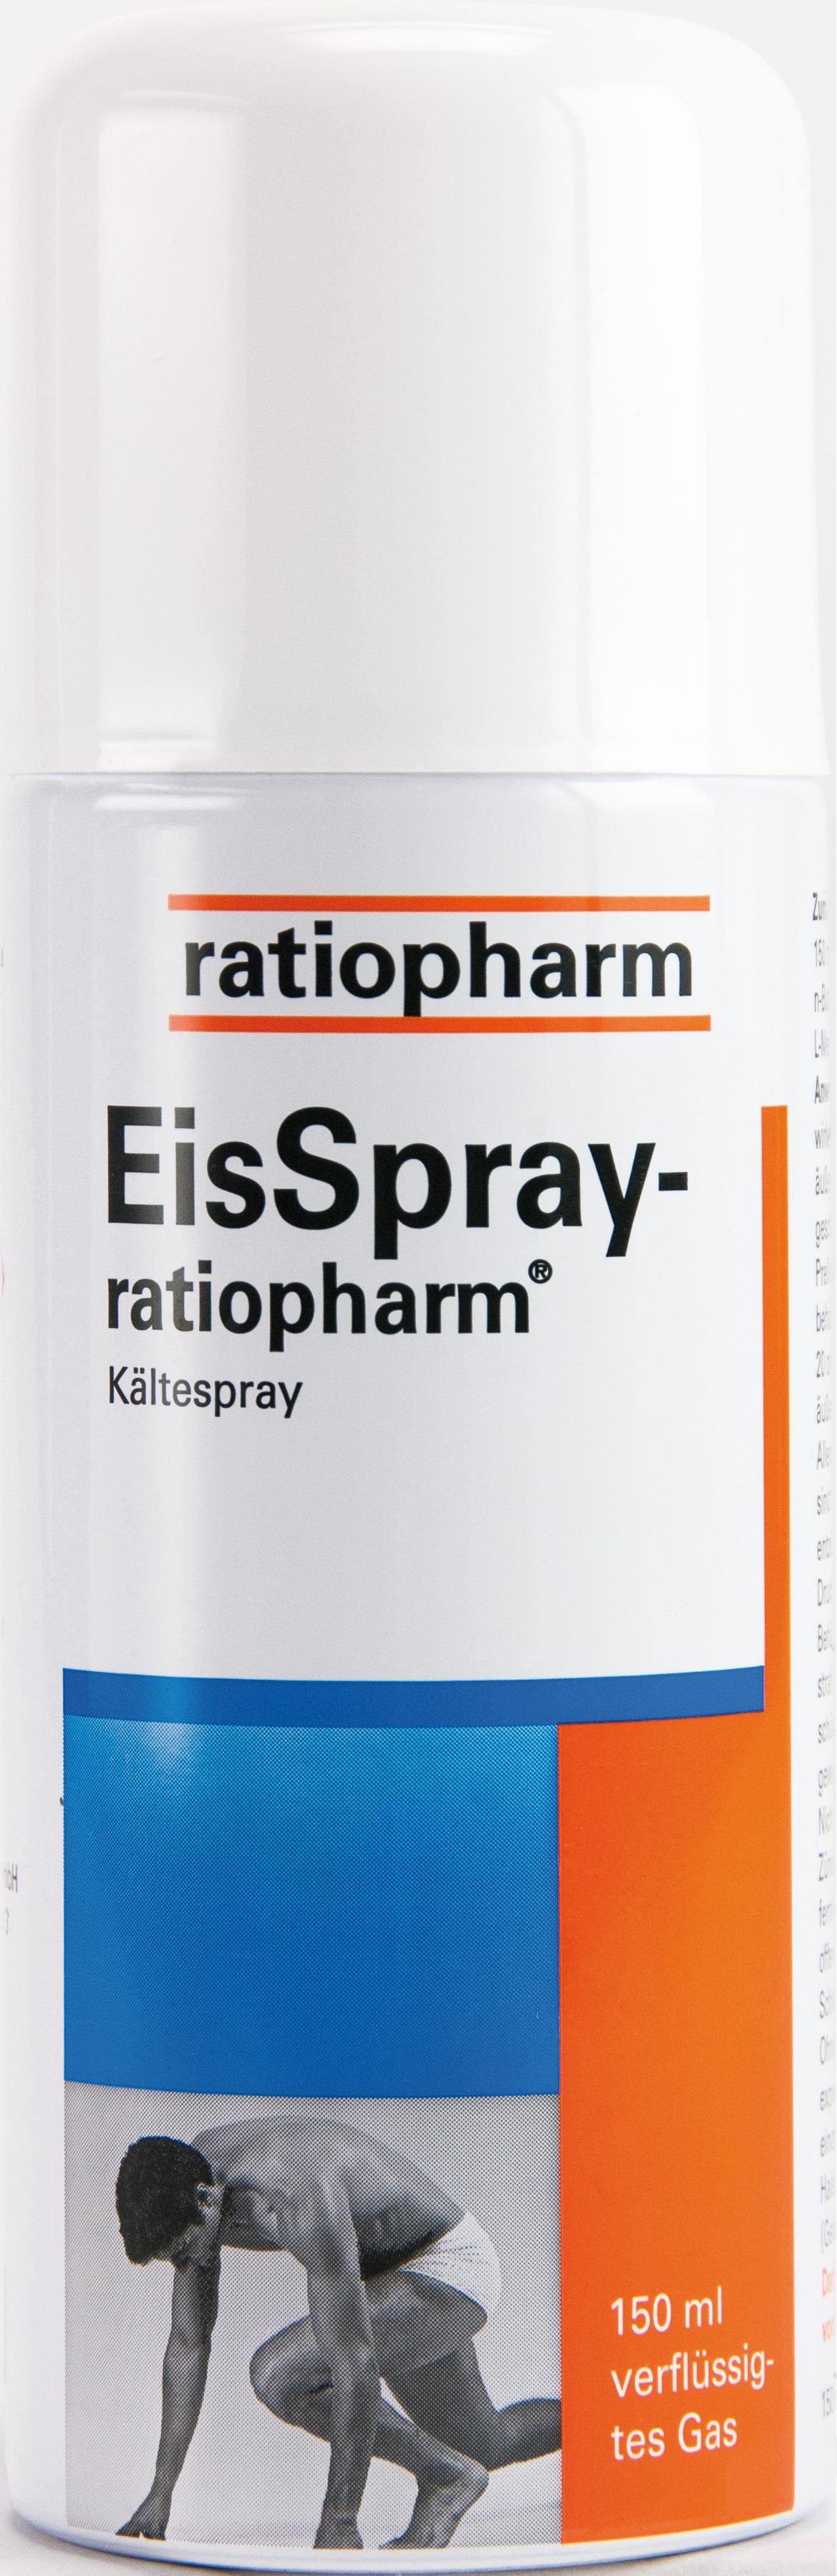 Eisspray Ratiopharm